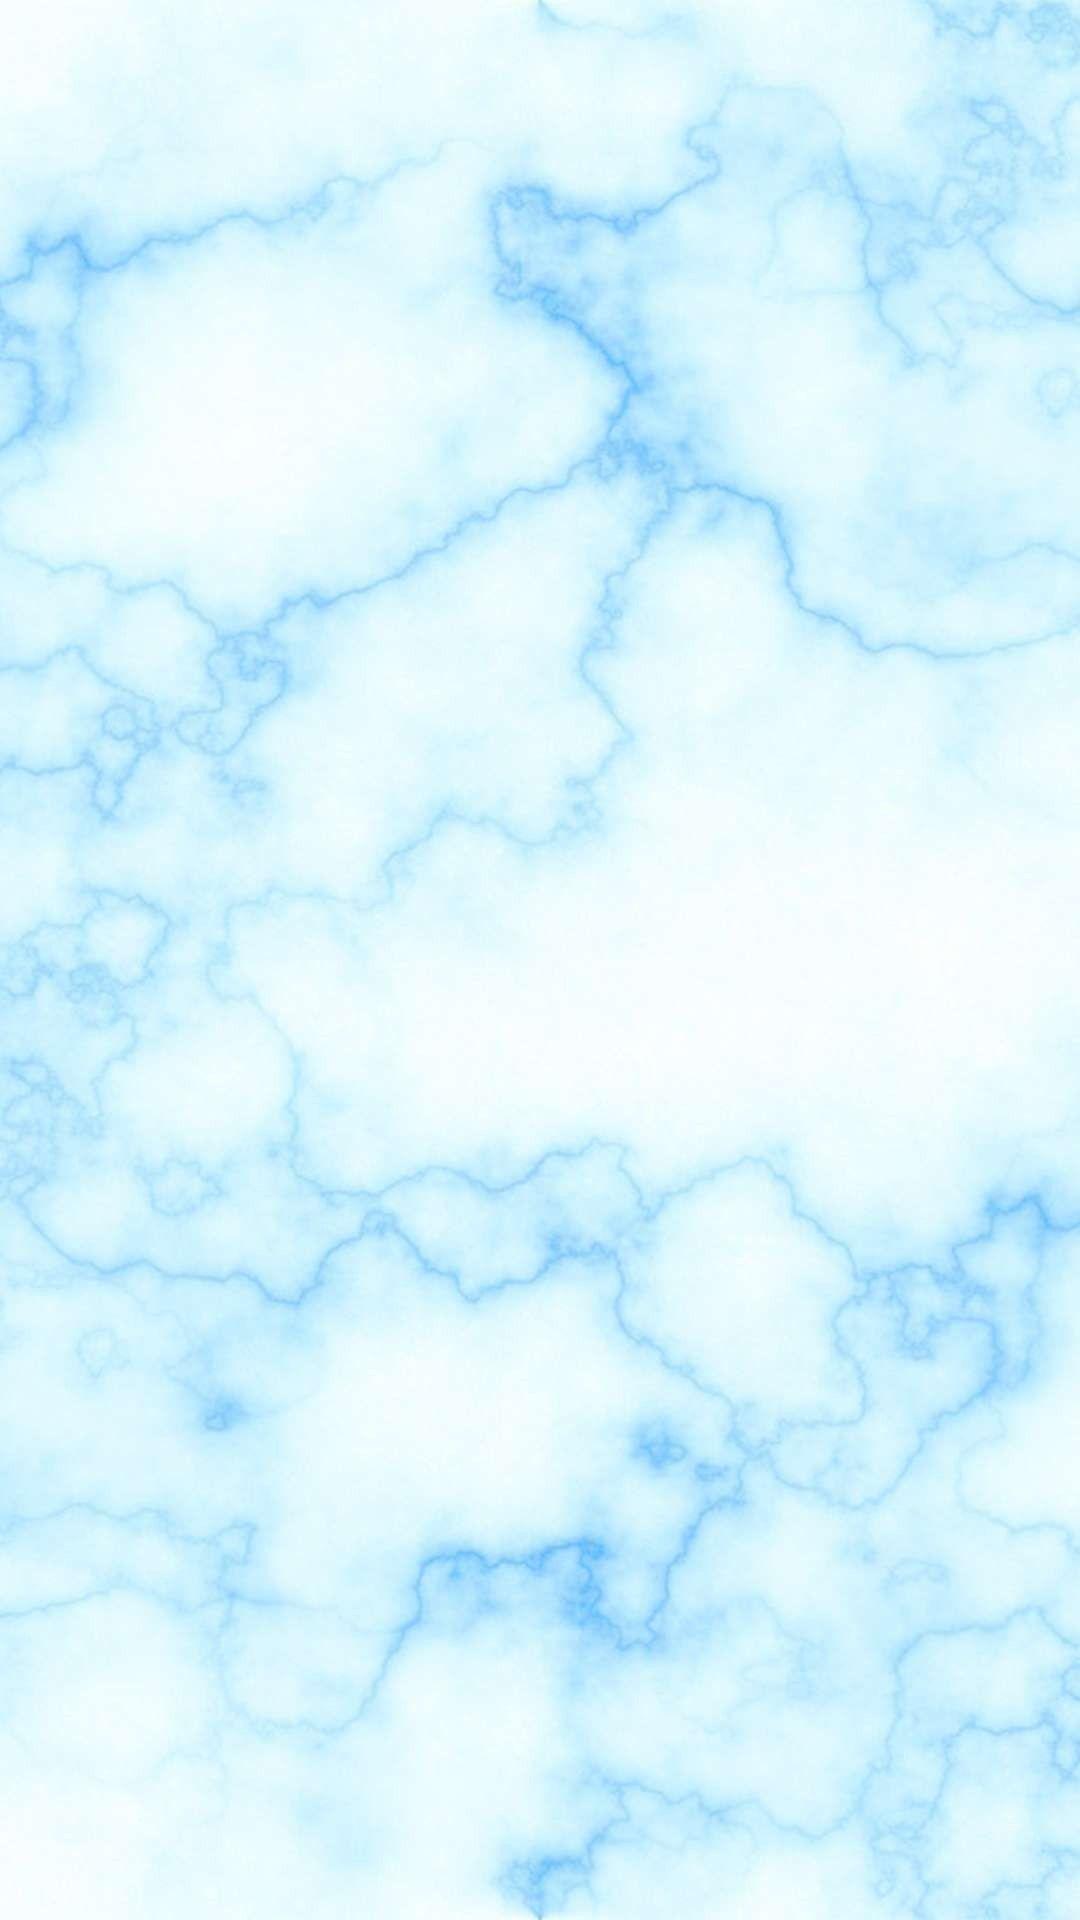 Pin By Samantha Keller On 1 Blue Marble Wallpaper Cute